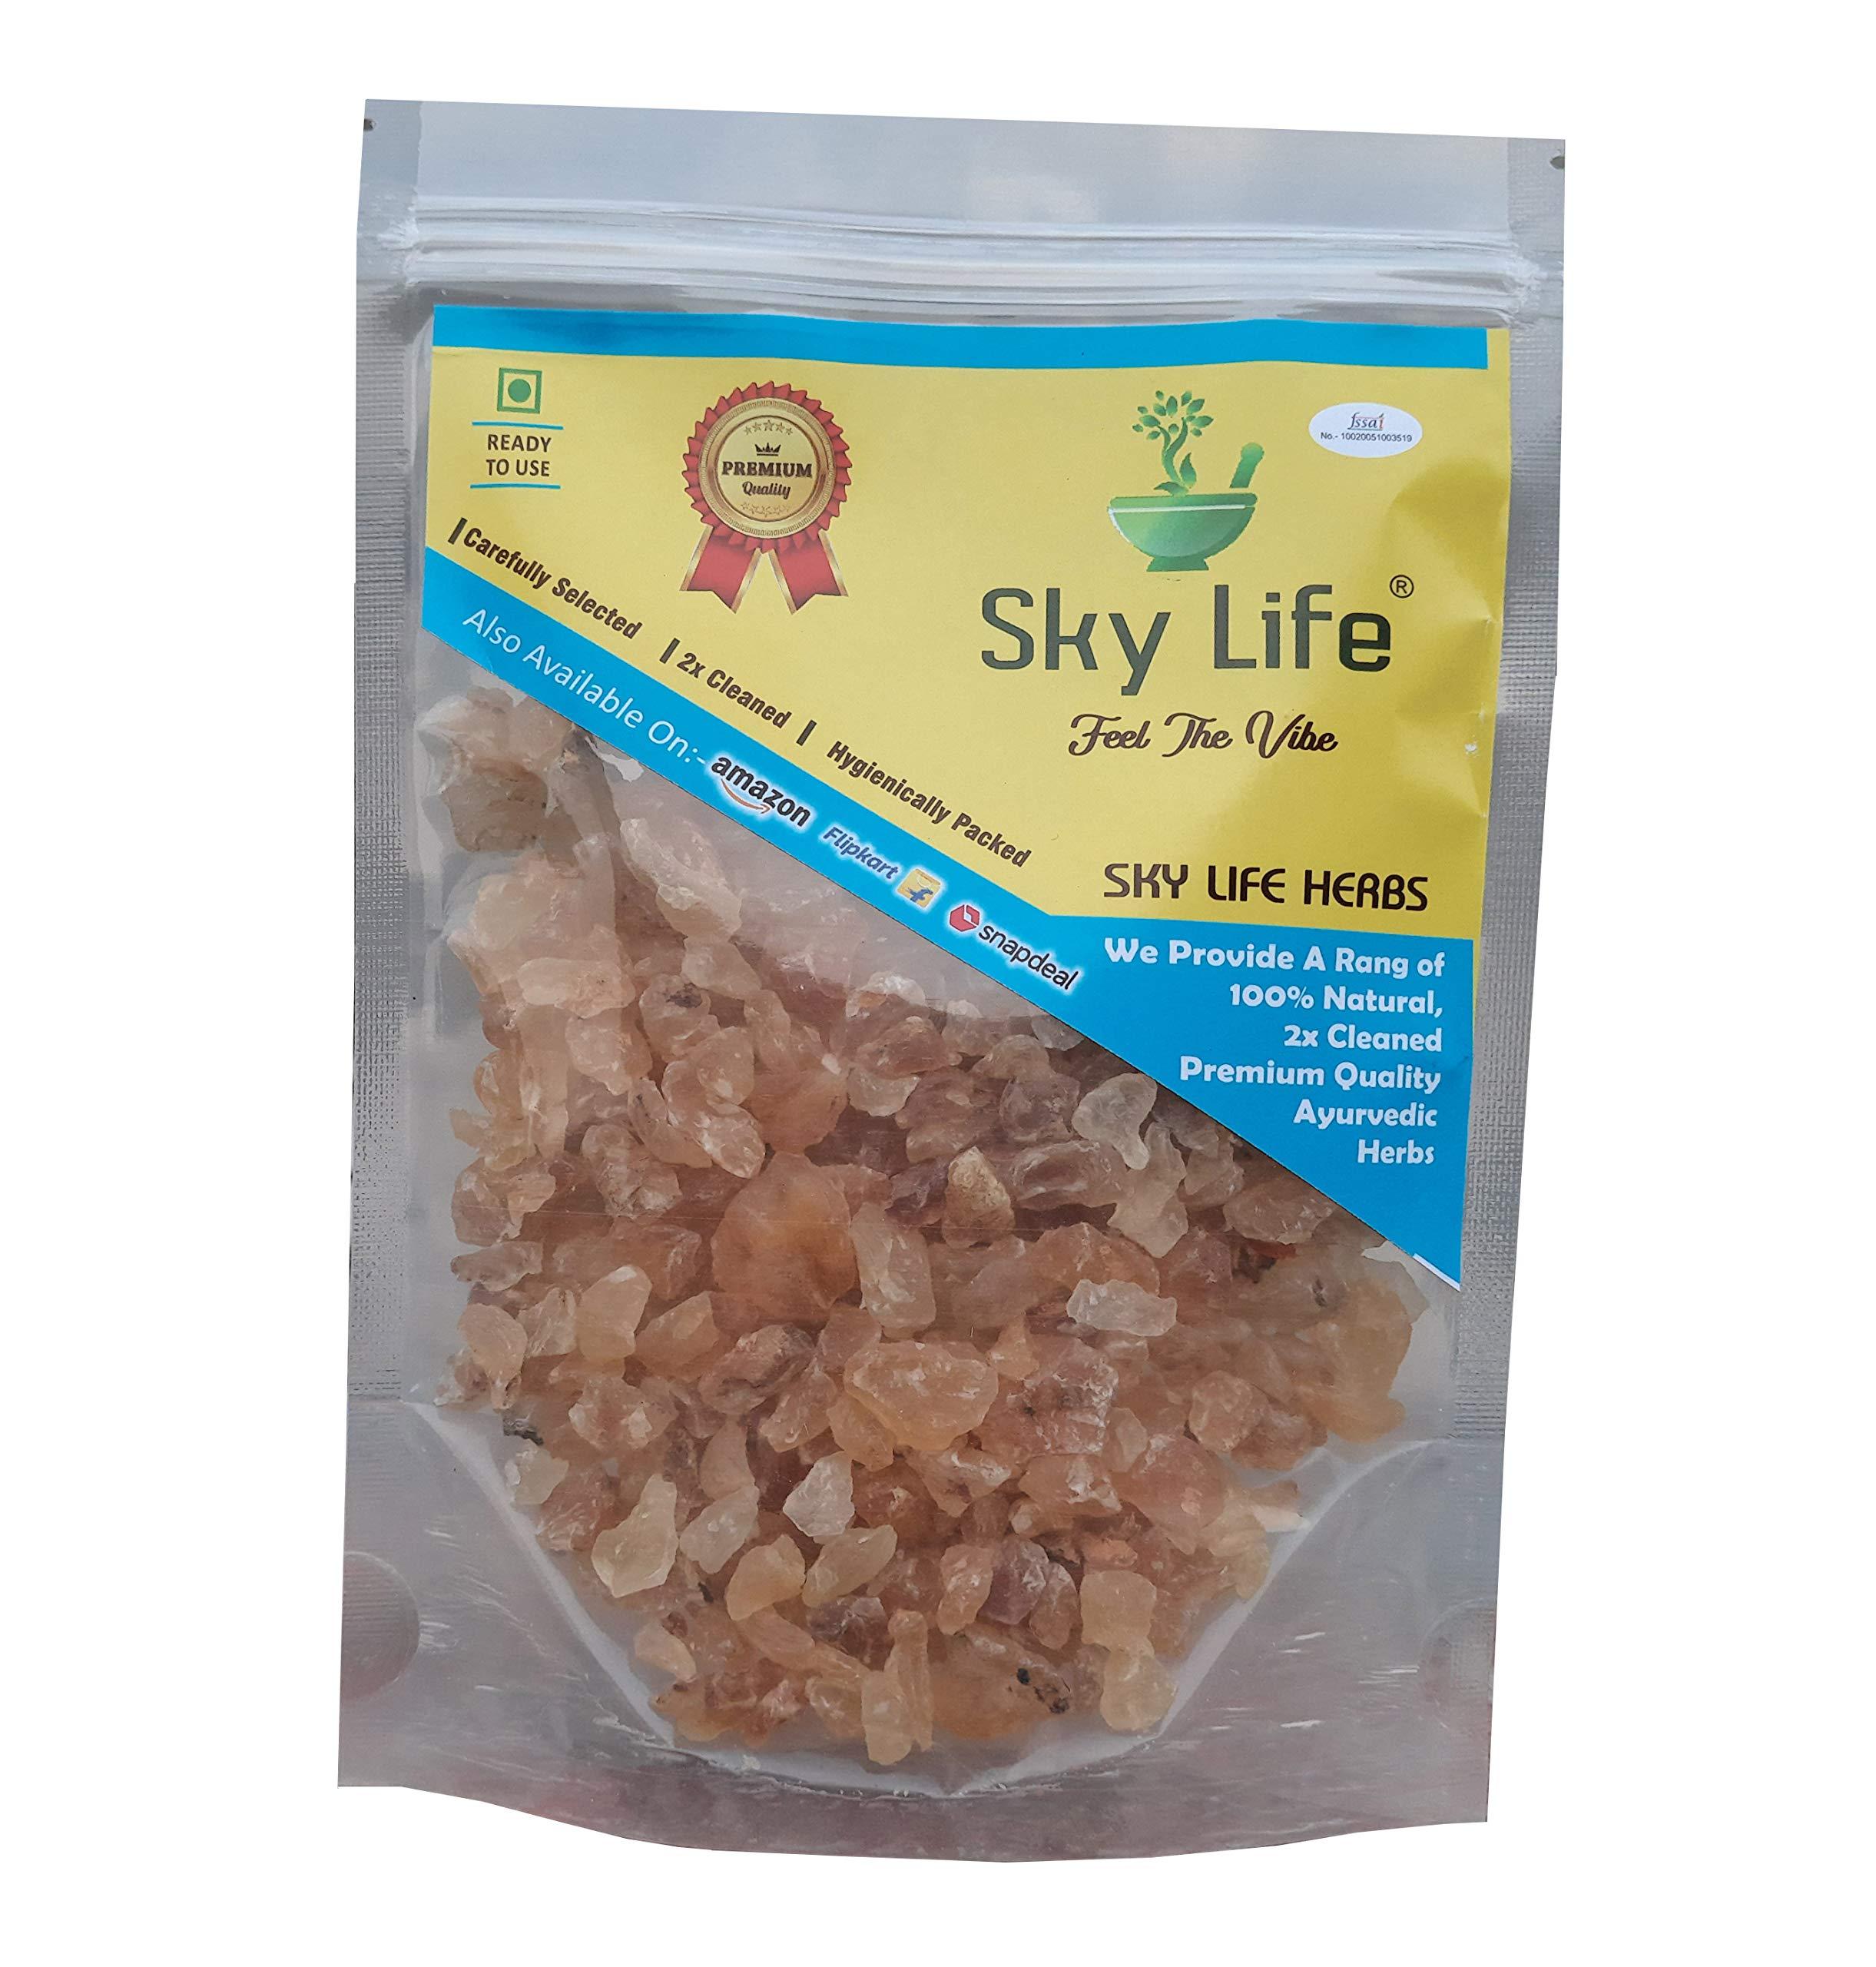 Sky life® Gond Katira - (100Grm) Tragacanth Gum - Kathila Gum - Kathila Gond - Dink Katora - Gaund Kani - गोंद कतीरा- Gum Edible - Gaund - Gondh Katira